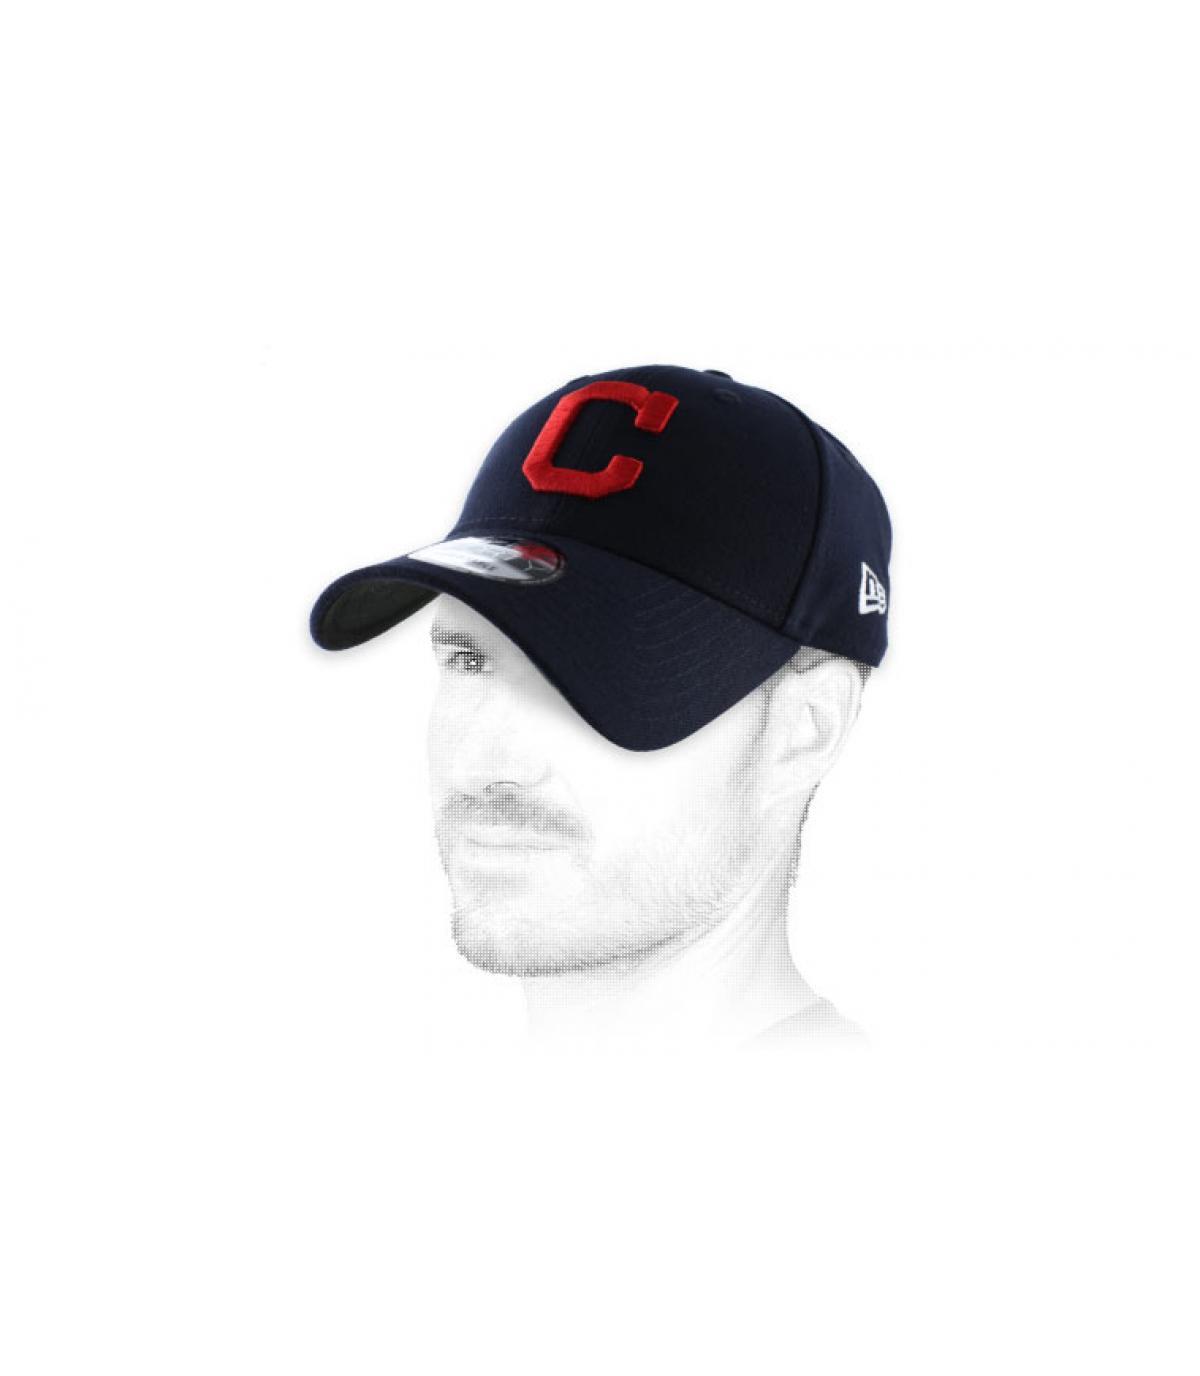 gorra azul curva roja C